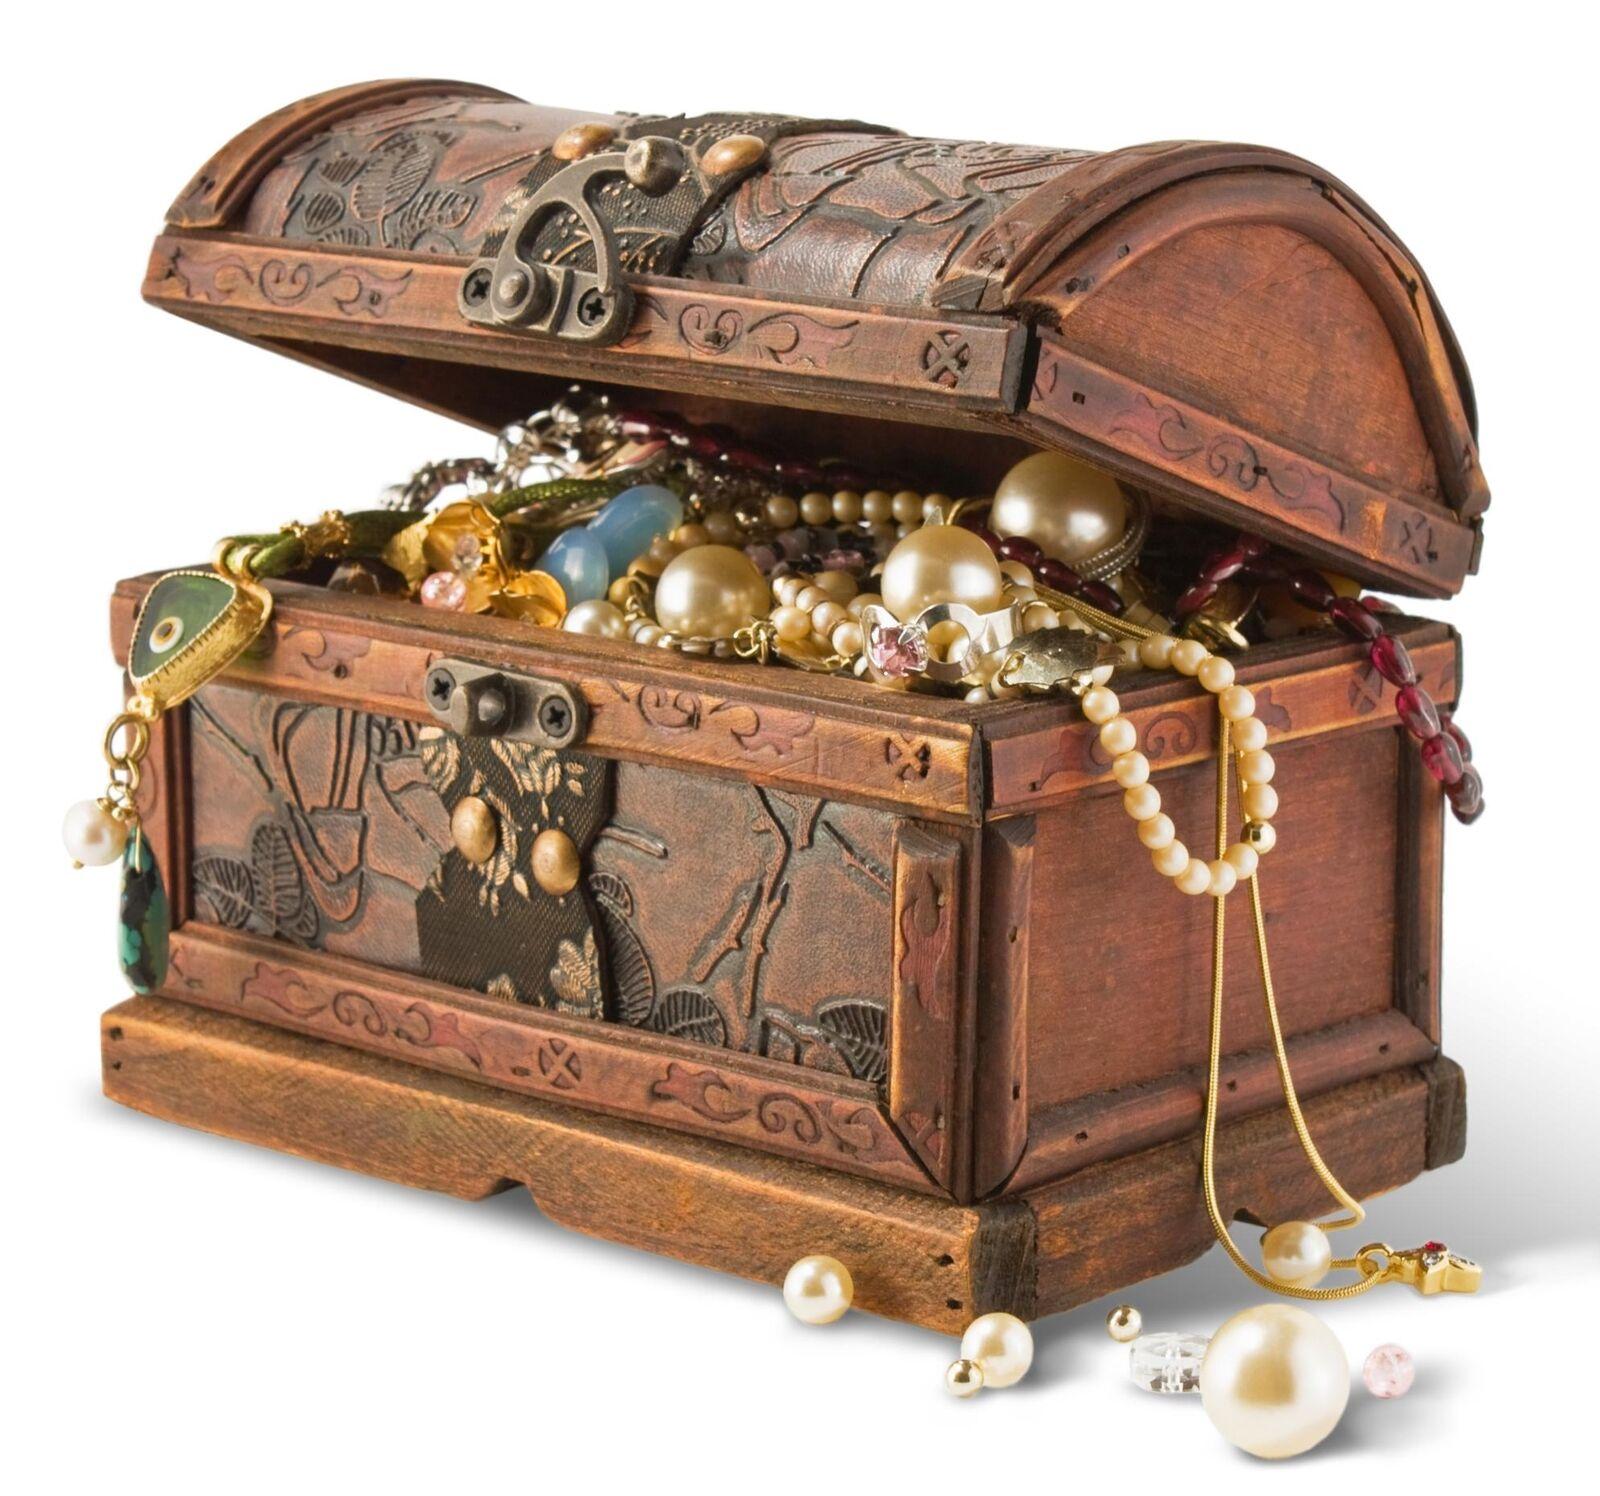 Imerald's Treasures